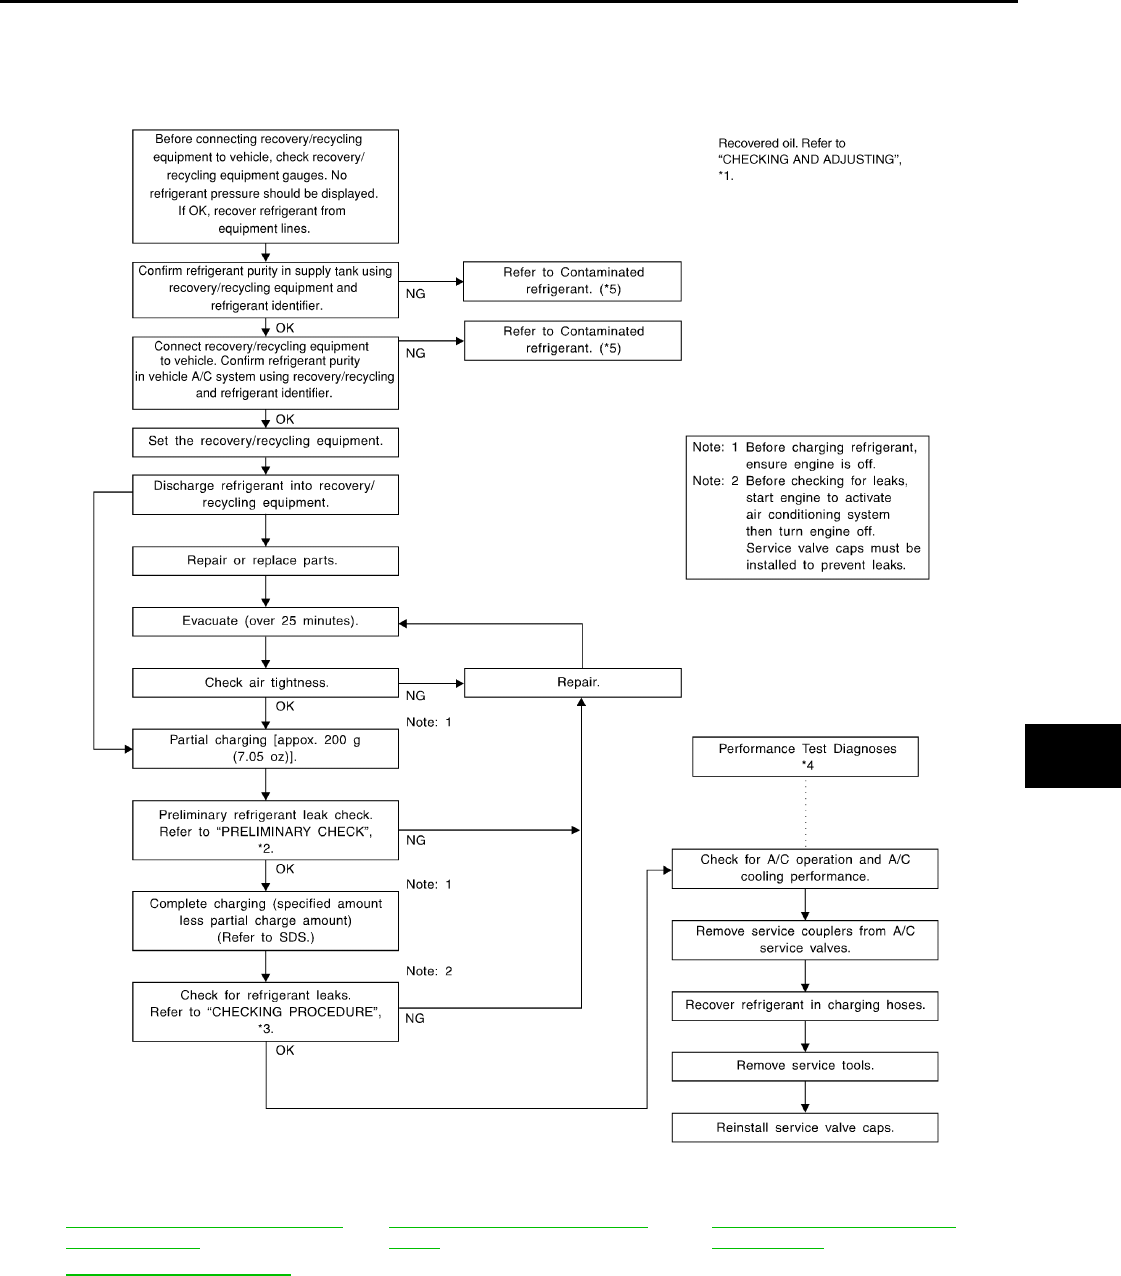 Nissan 2011 Versa Owners Manual SM1E 1C11U0(MTC)